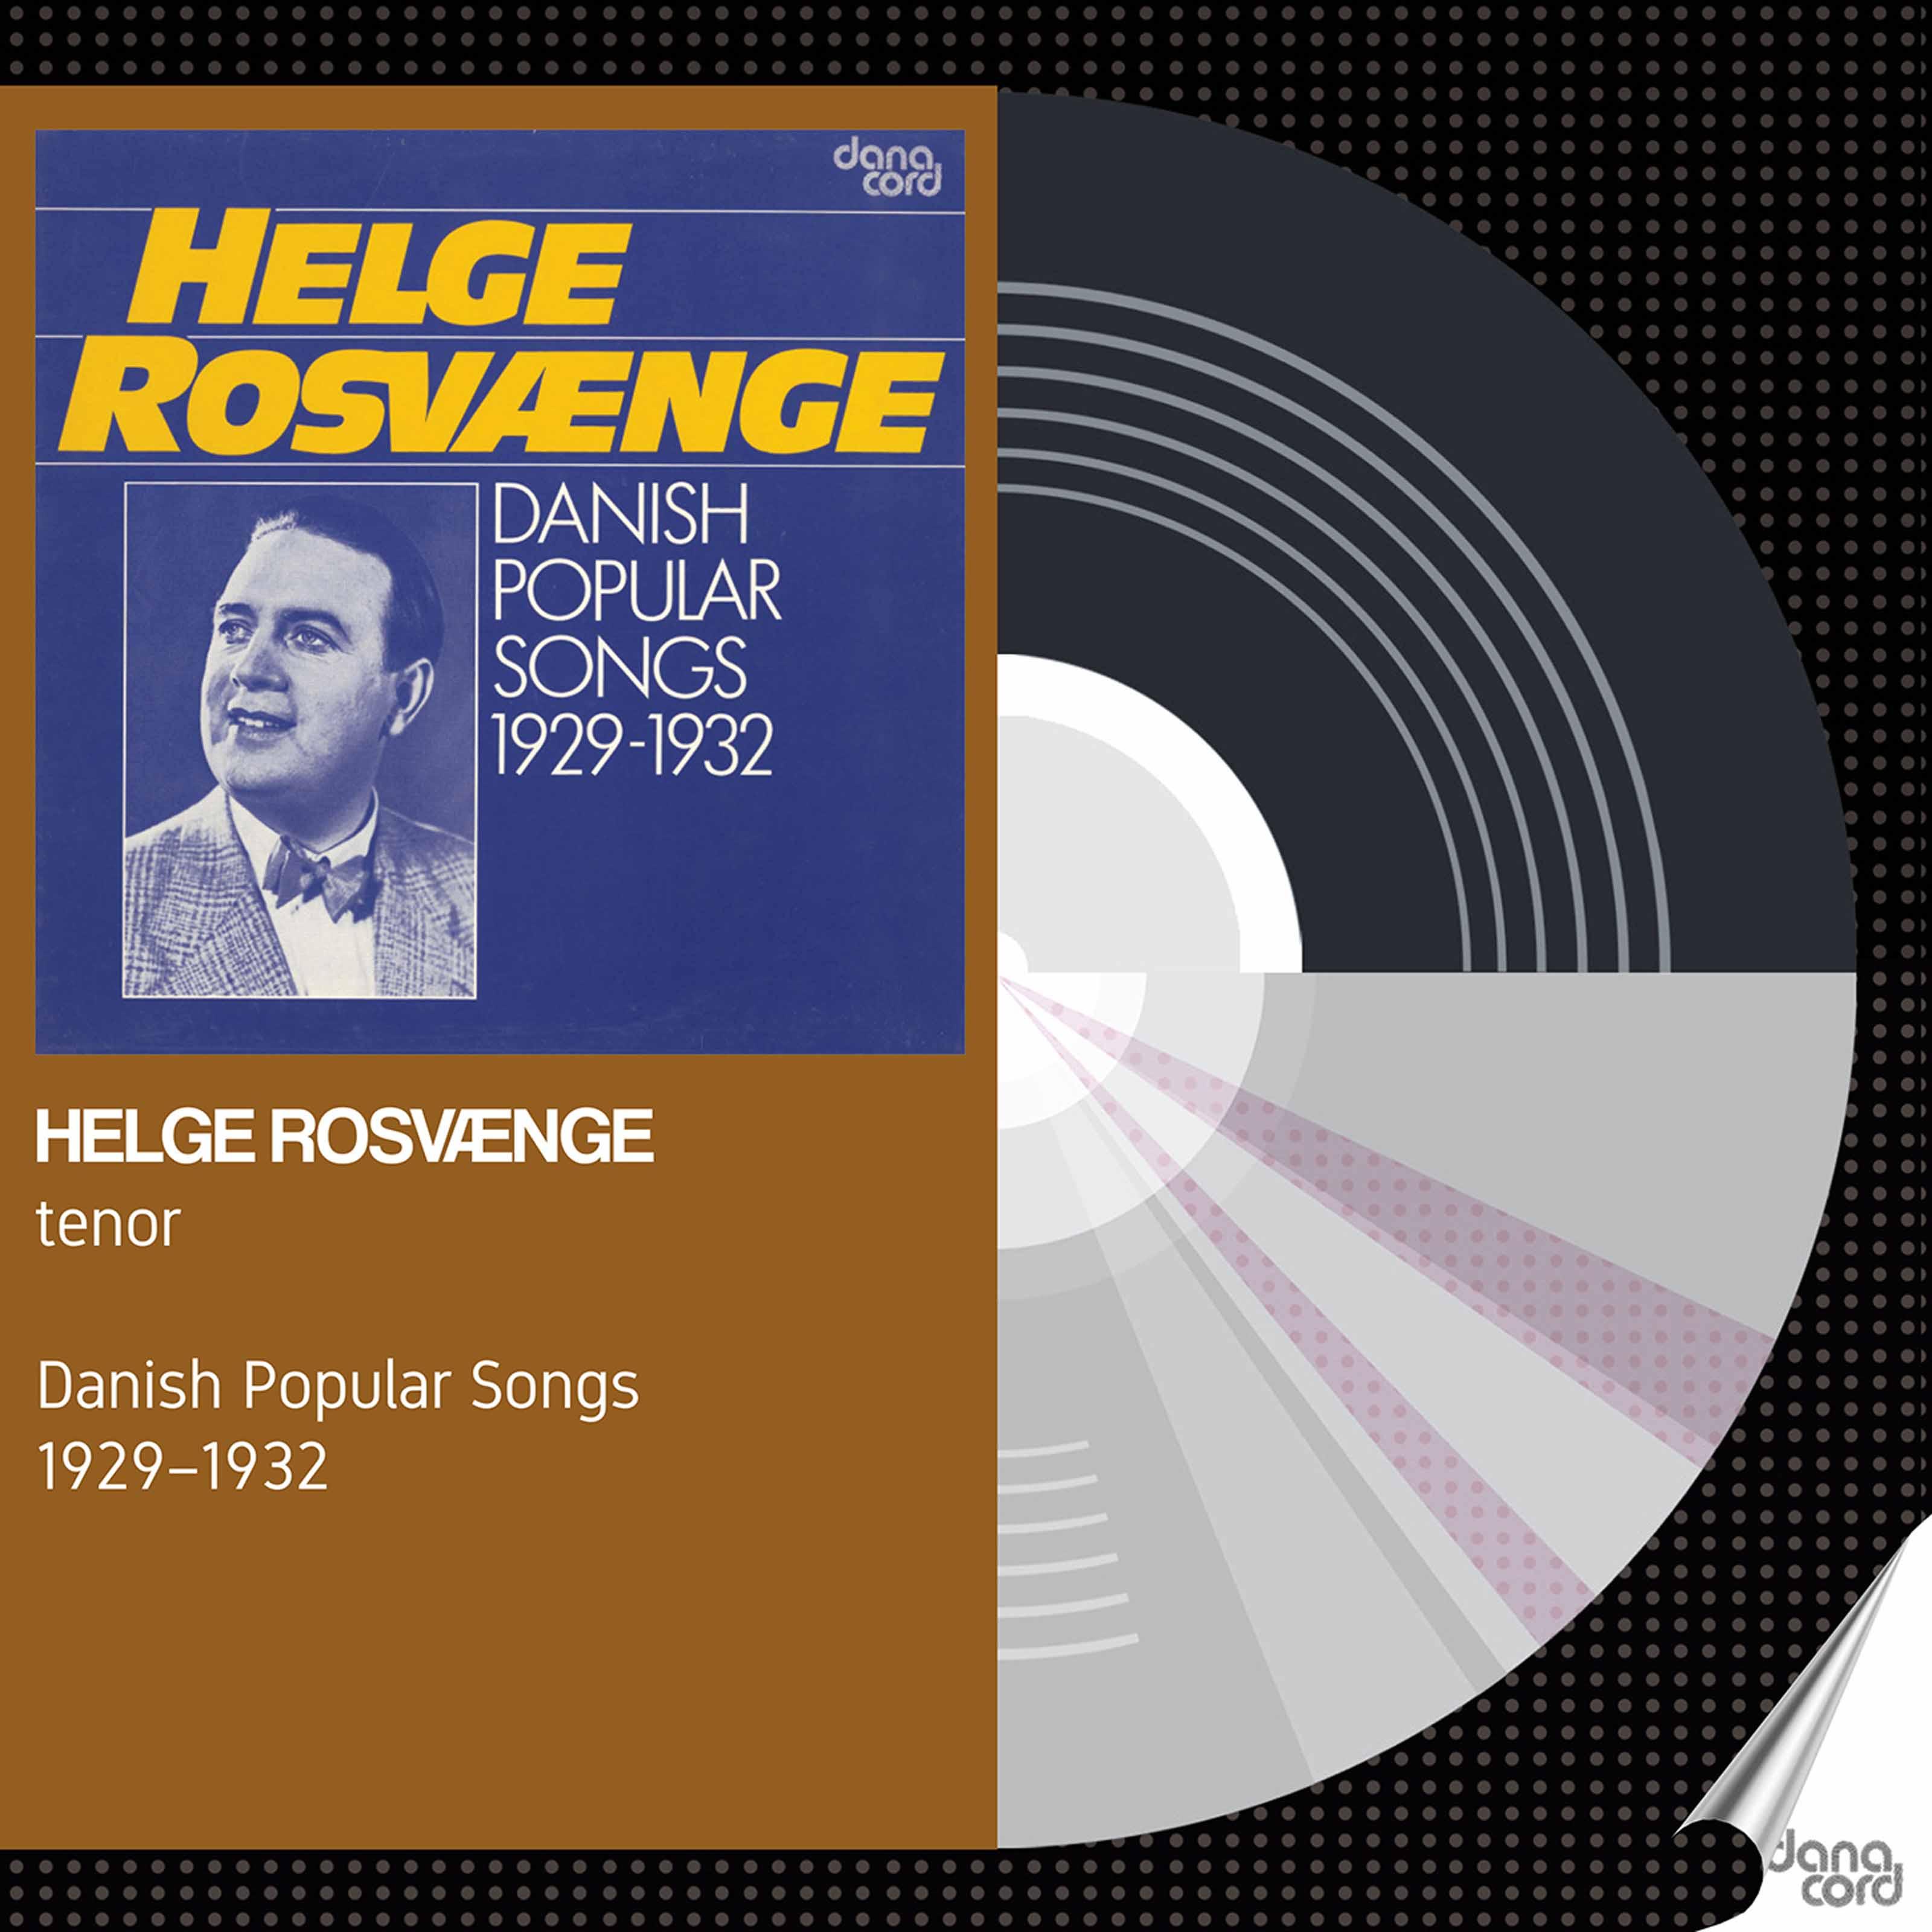 Helge Rosvaenge: Danish Popular Songs 1929-1932